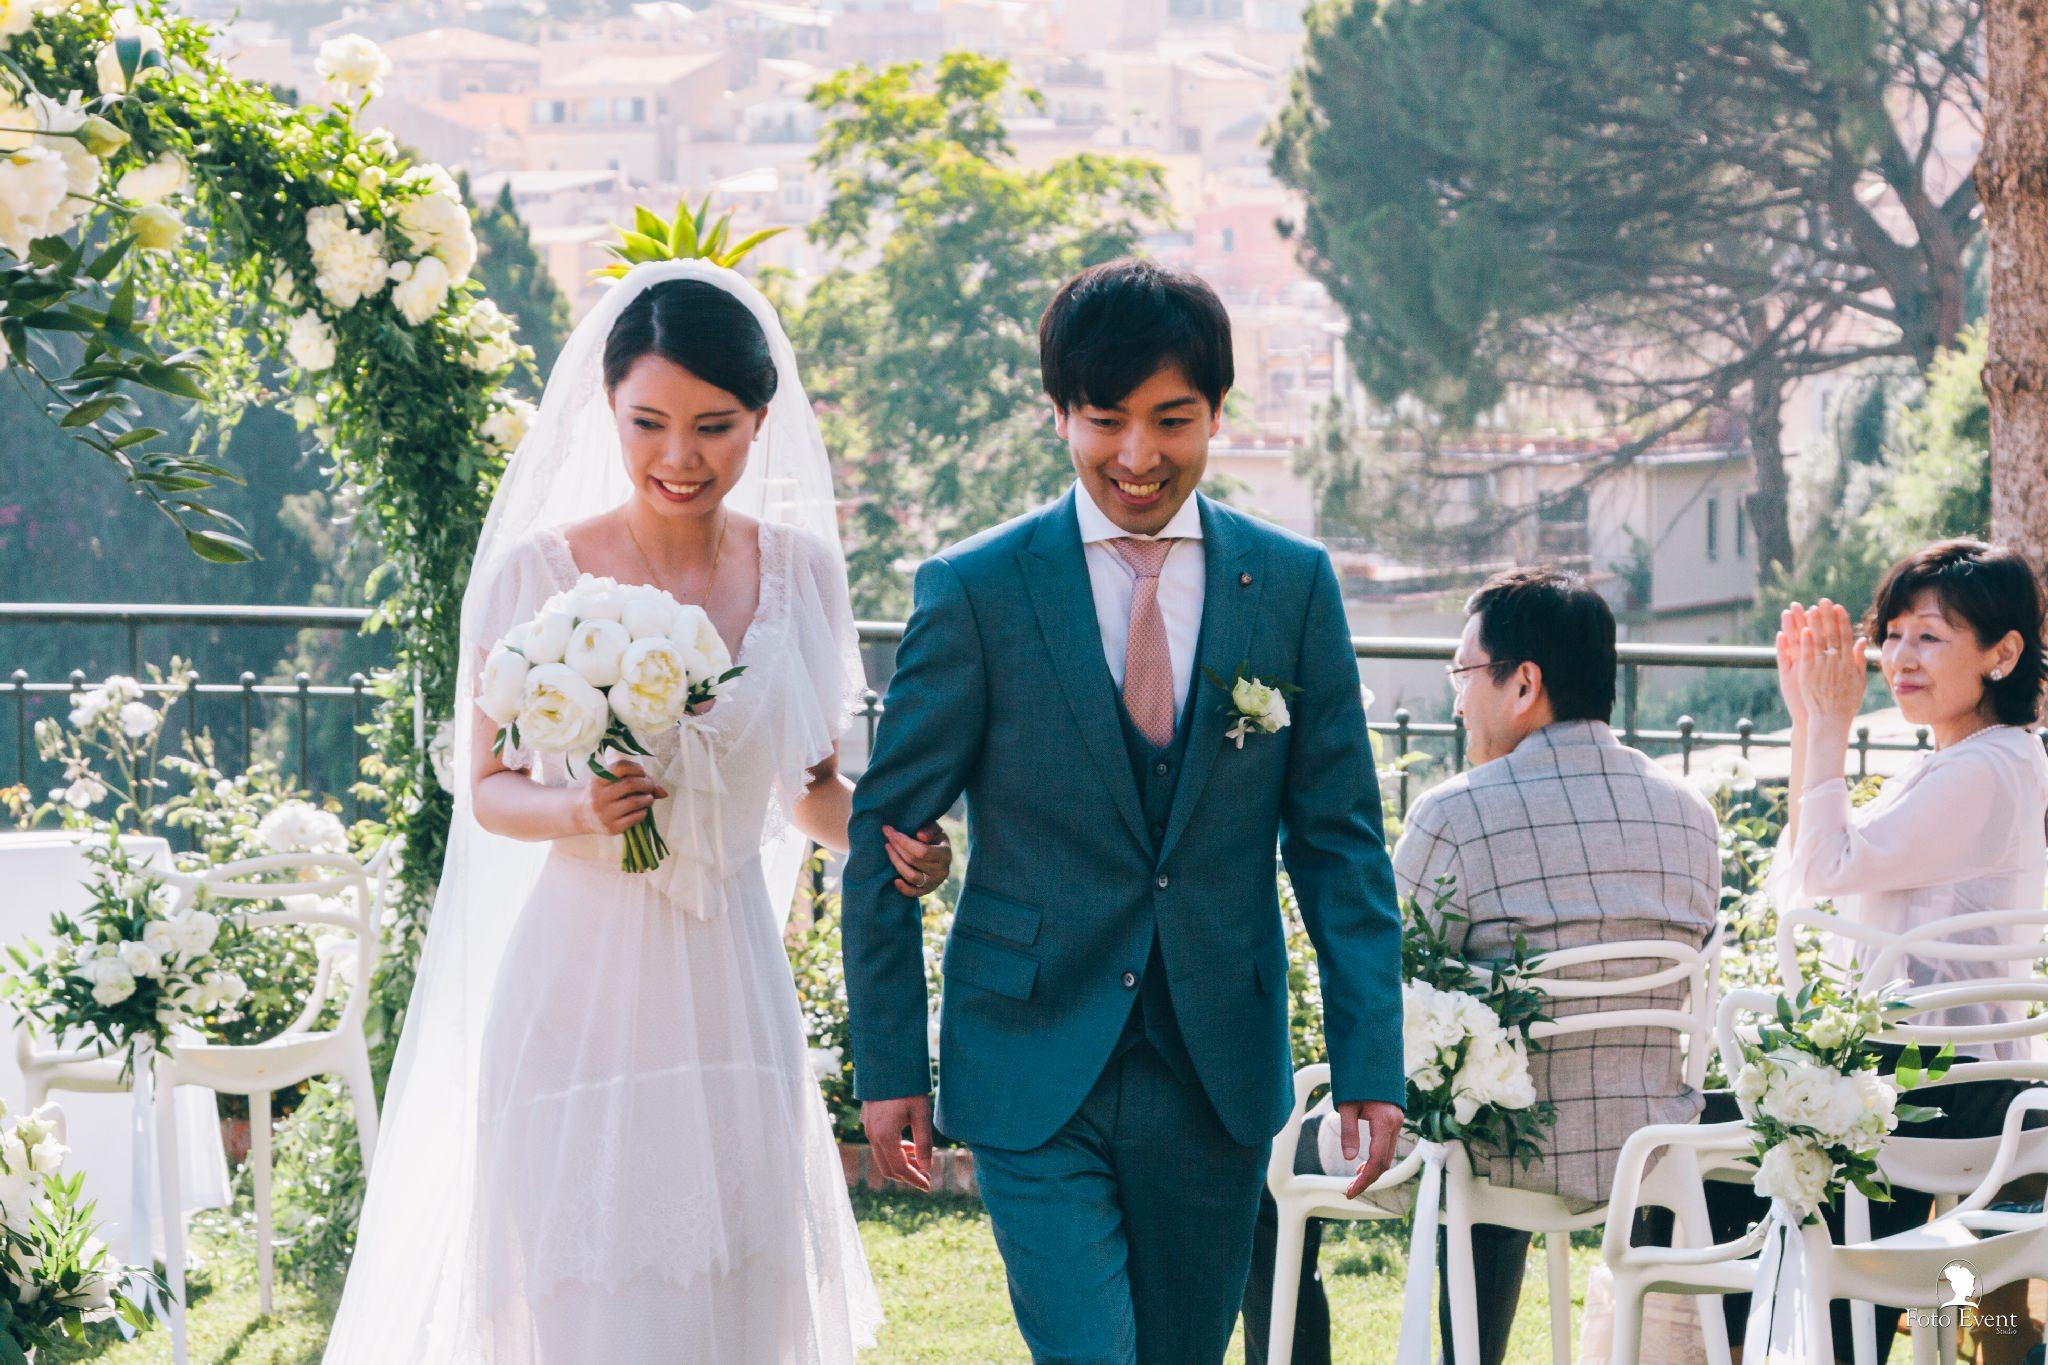 265-2019-06-14-Wedding-Yume-e-Makoto-Isee-7DL-326